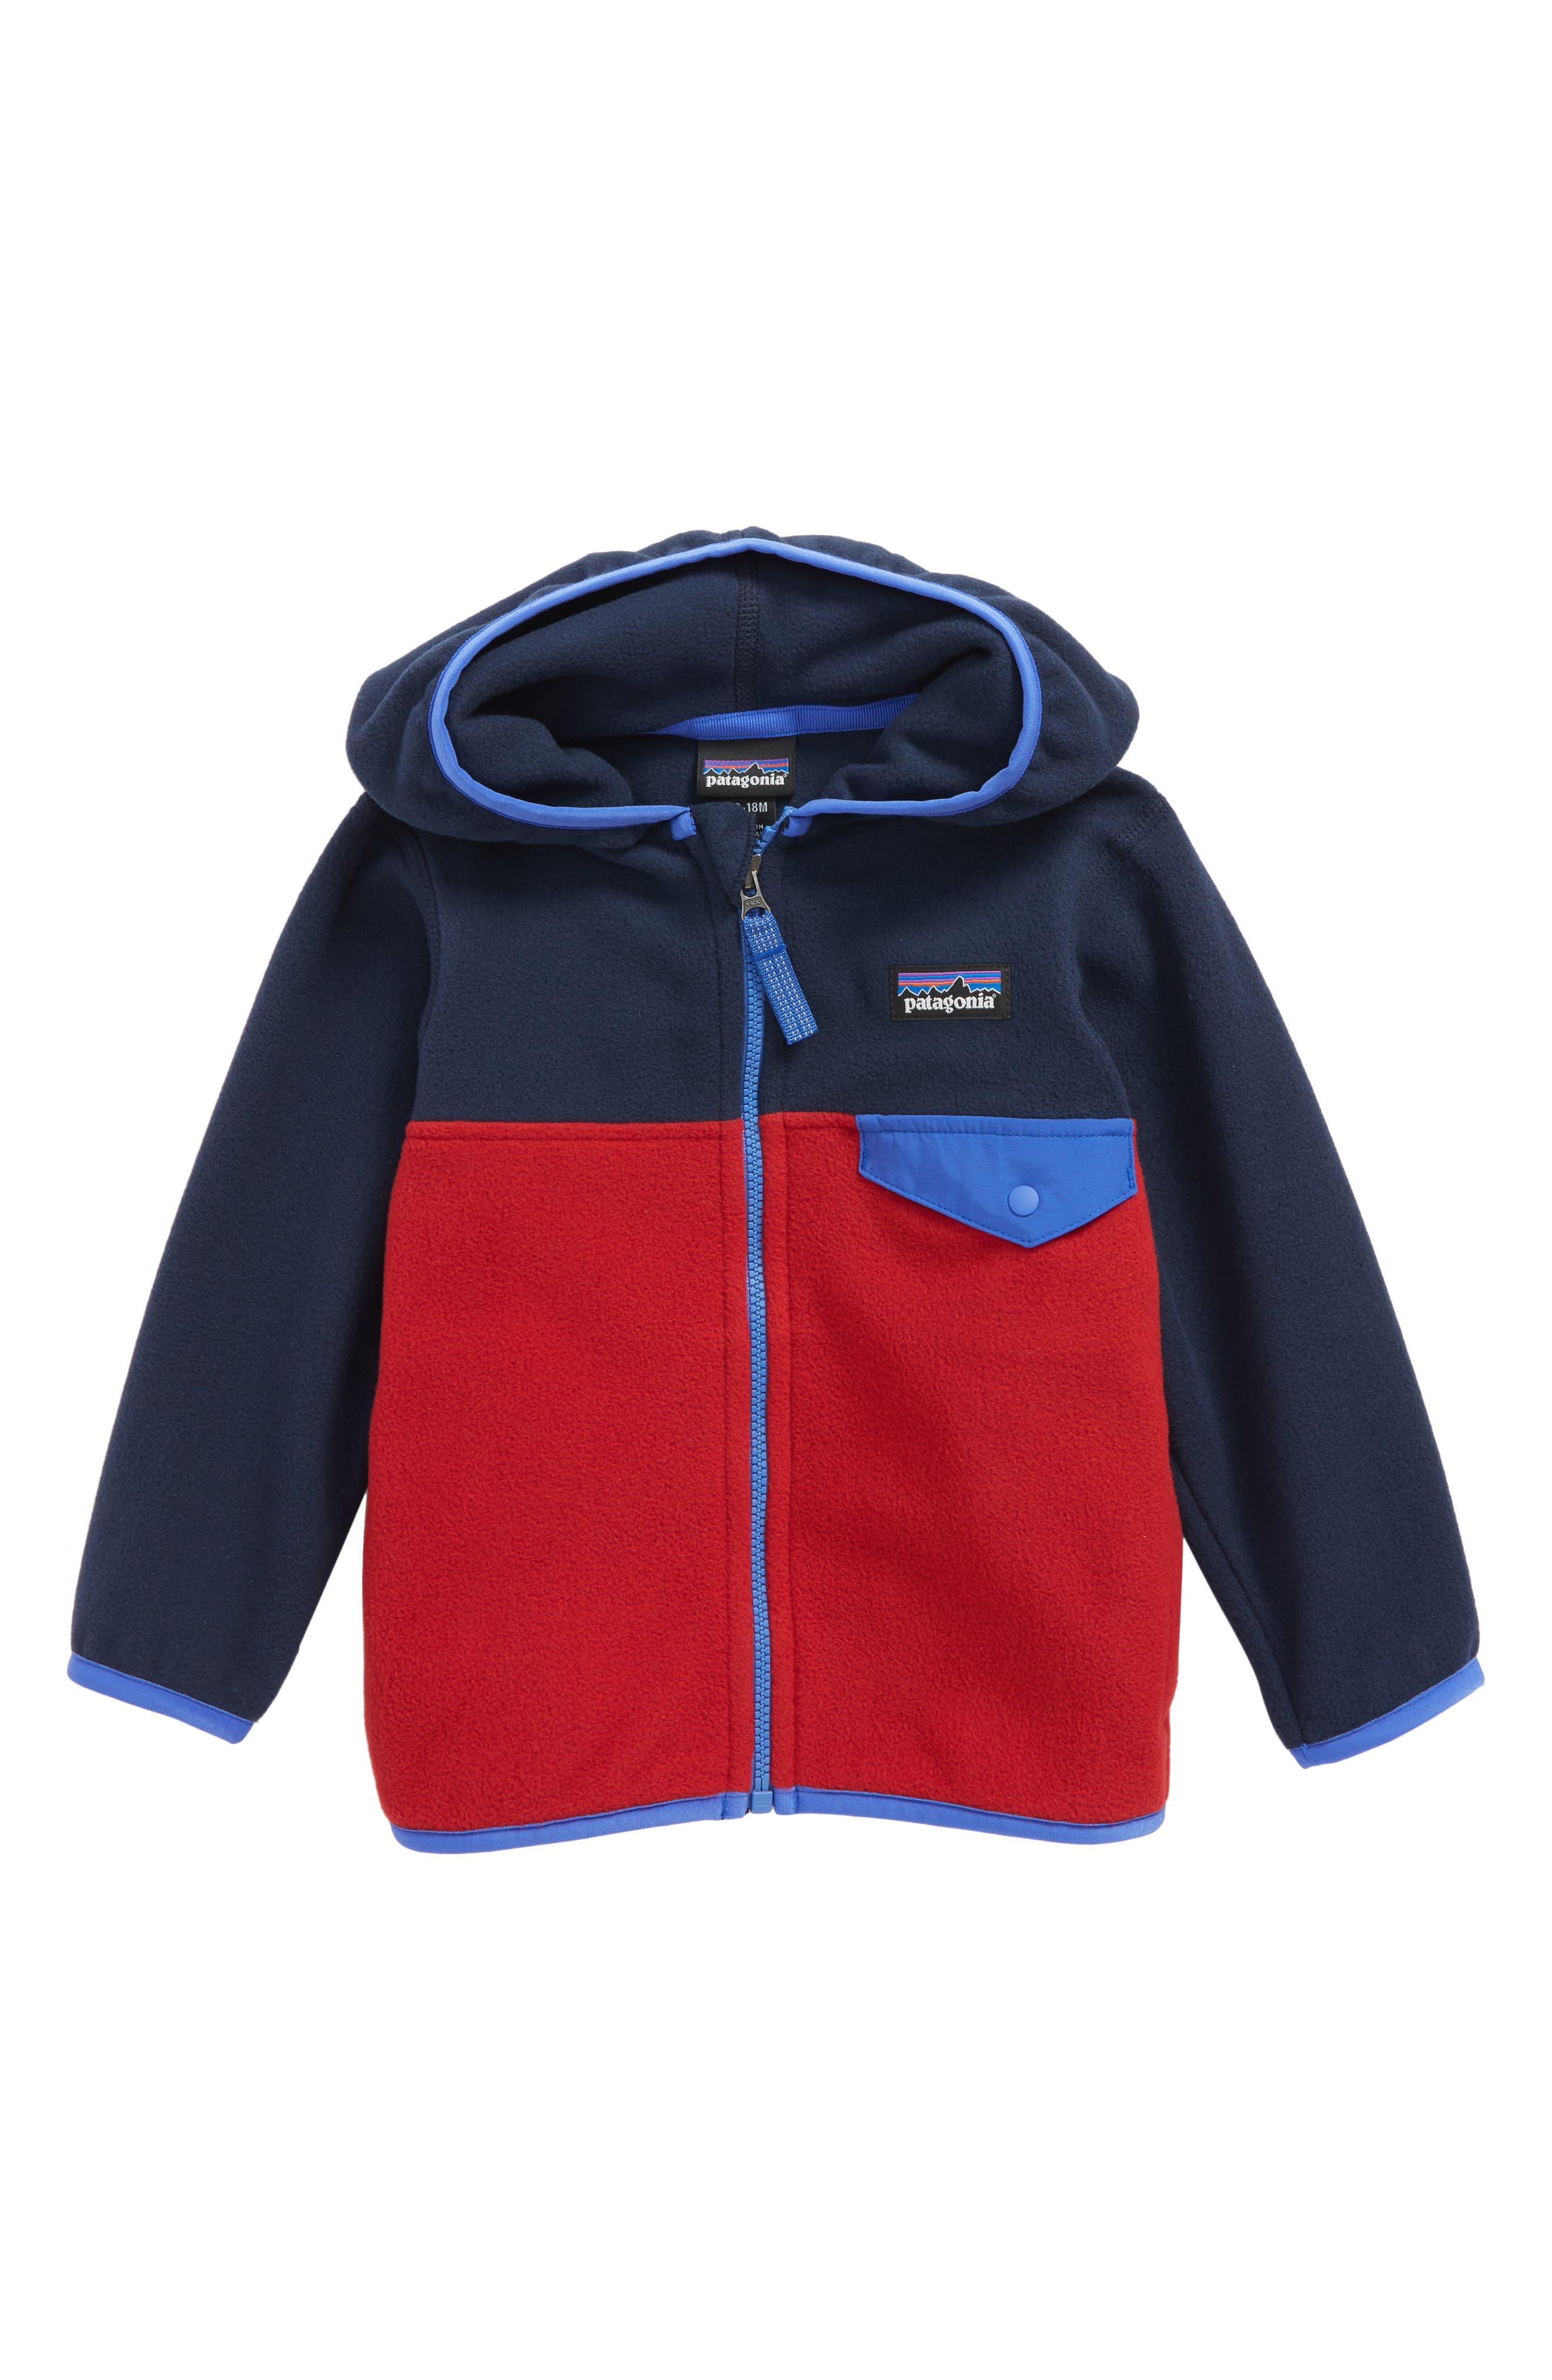 Alternate Image 1 Selected - Patagonia Micro D® Snap-T® Fleece Jacket (Baby Boys)